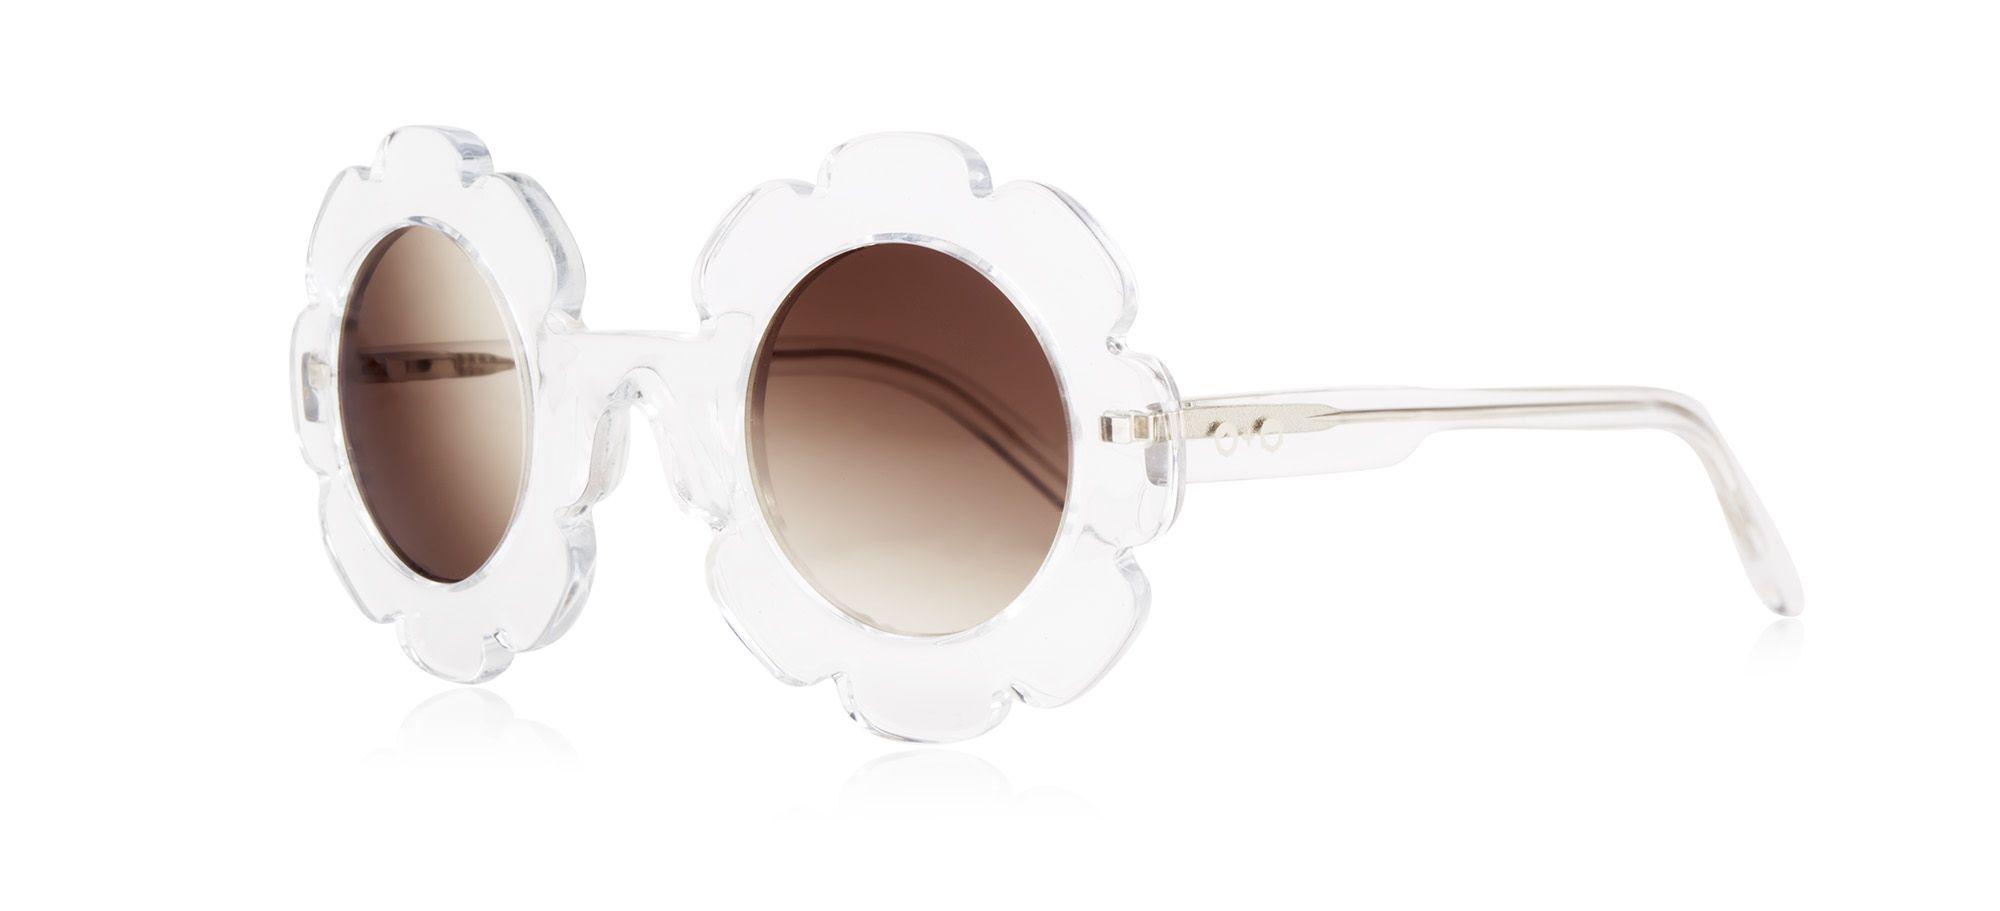 Kids sunglasses sons daughters eyewear the